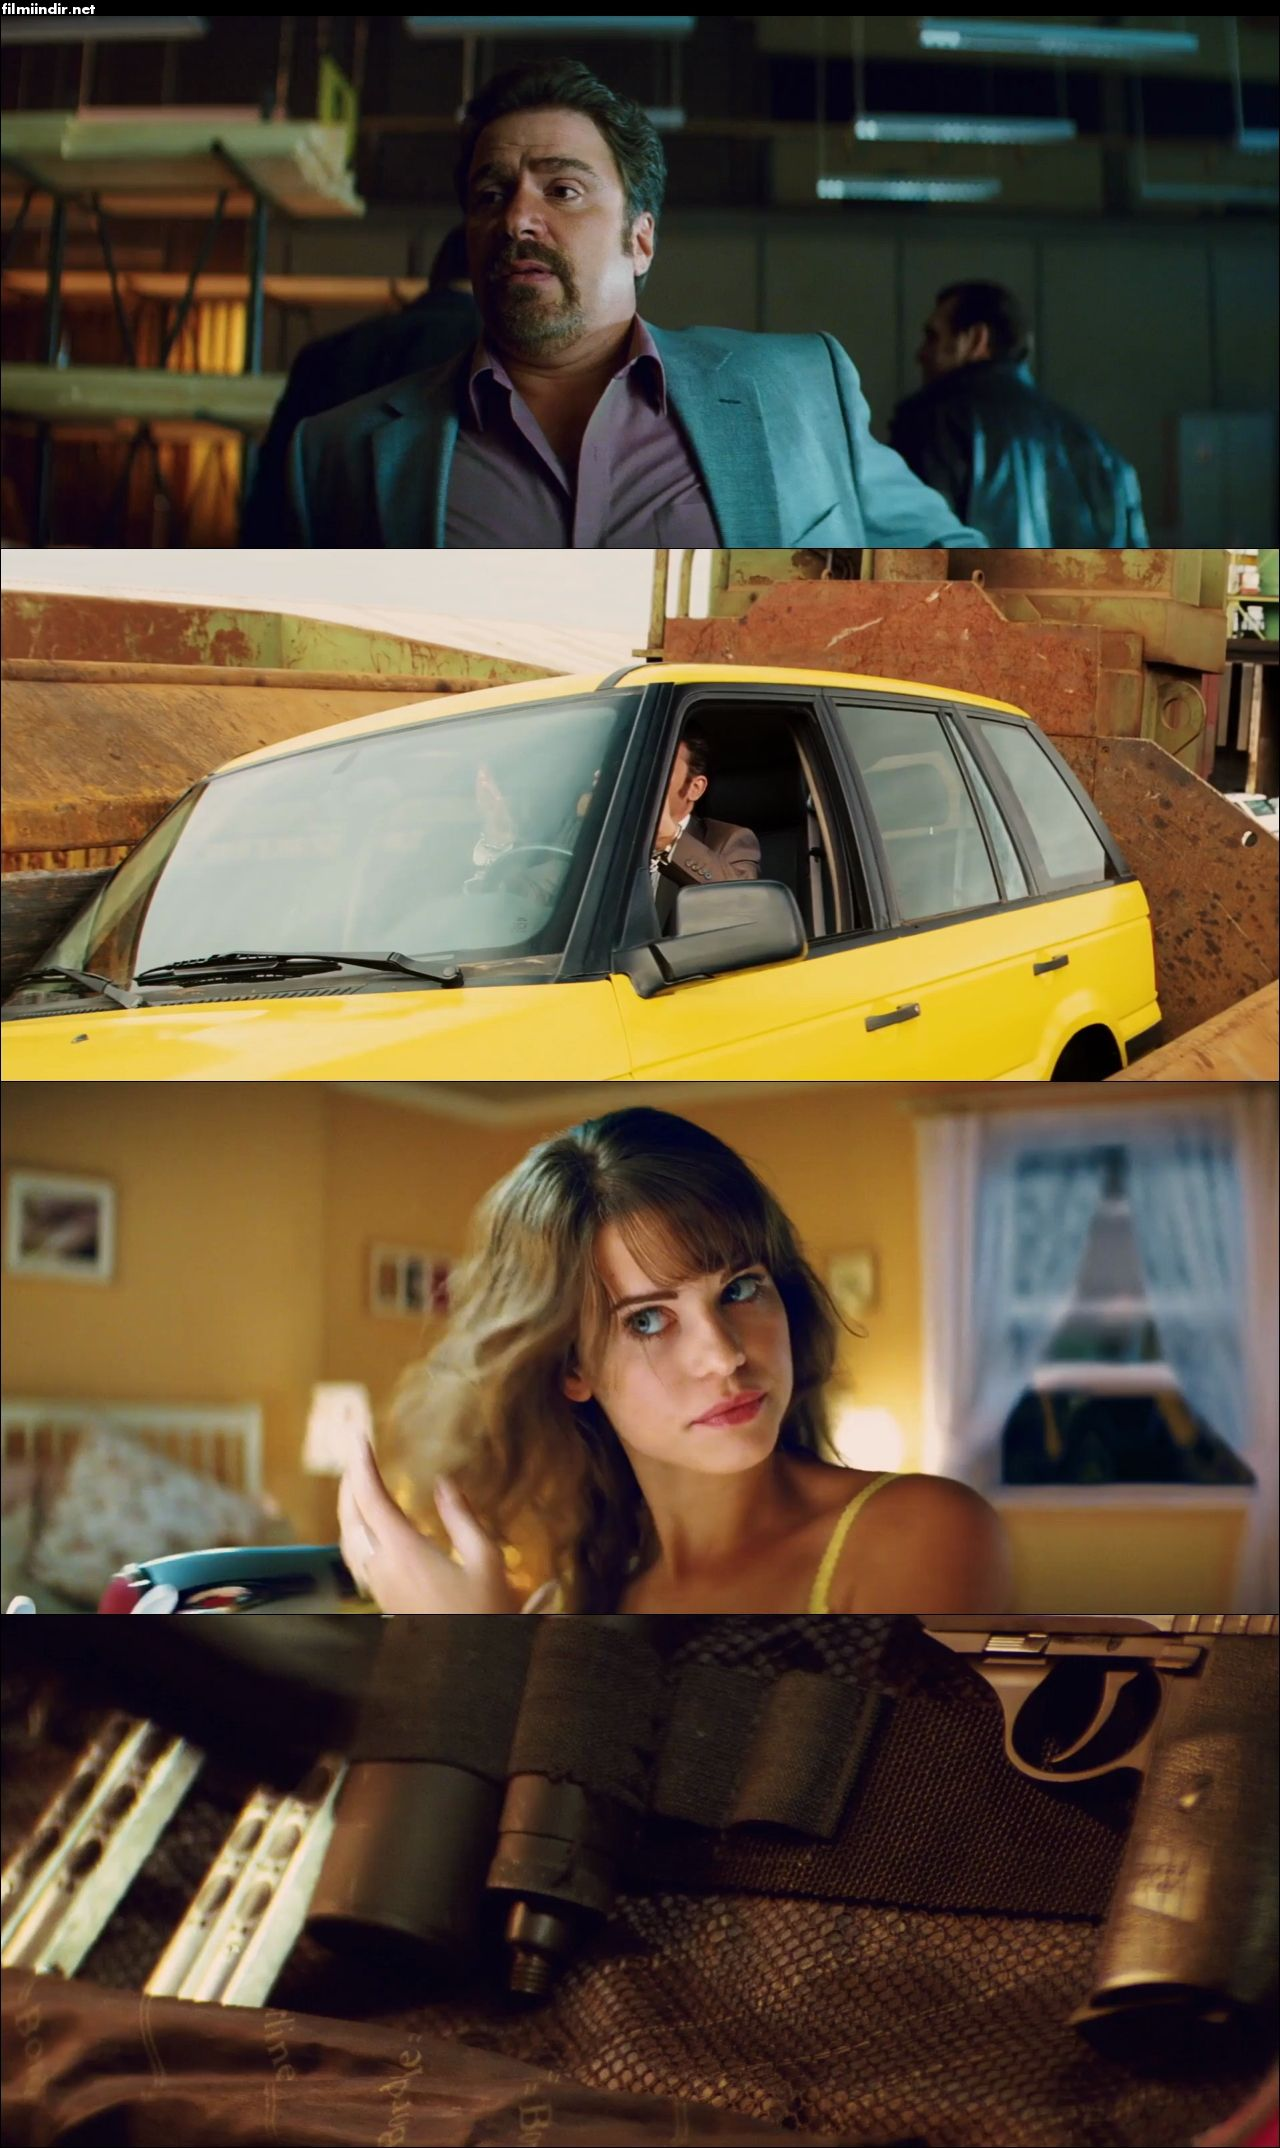 Göster Gününü - Kick-Ass (2010) türkçe dublaj film indir